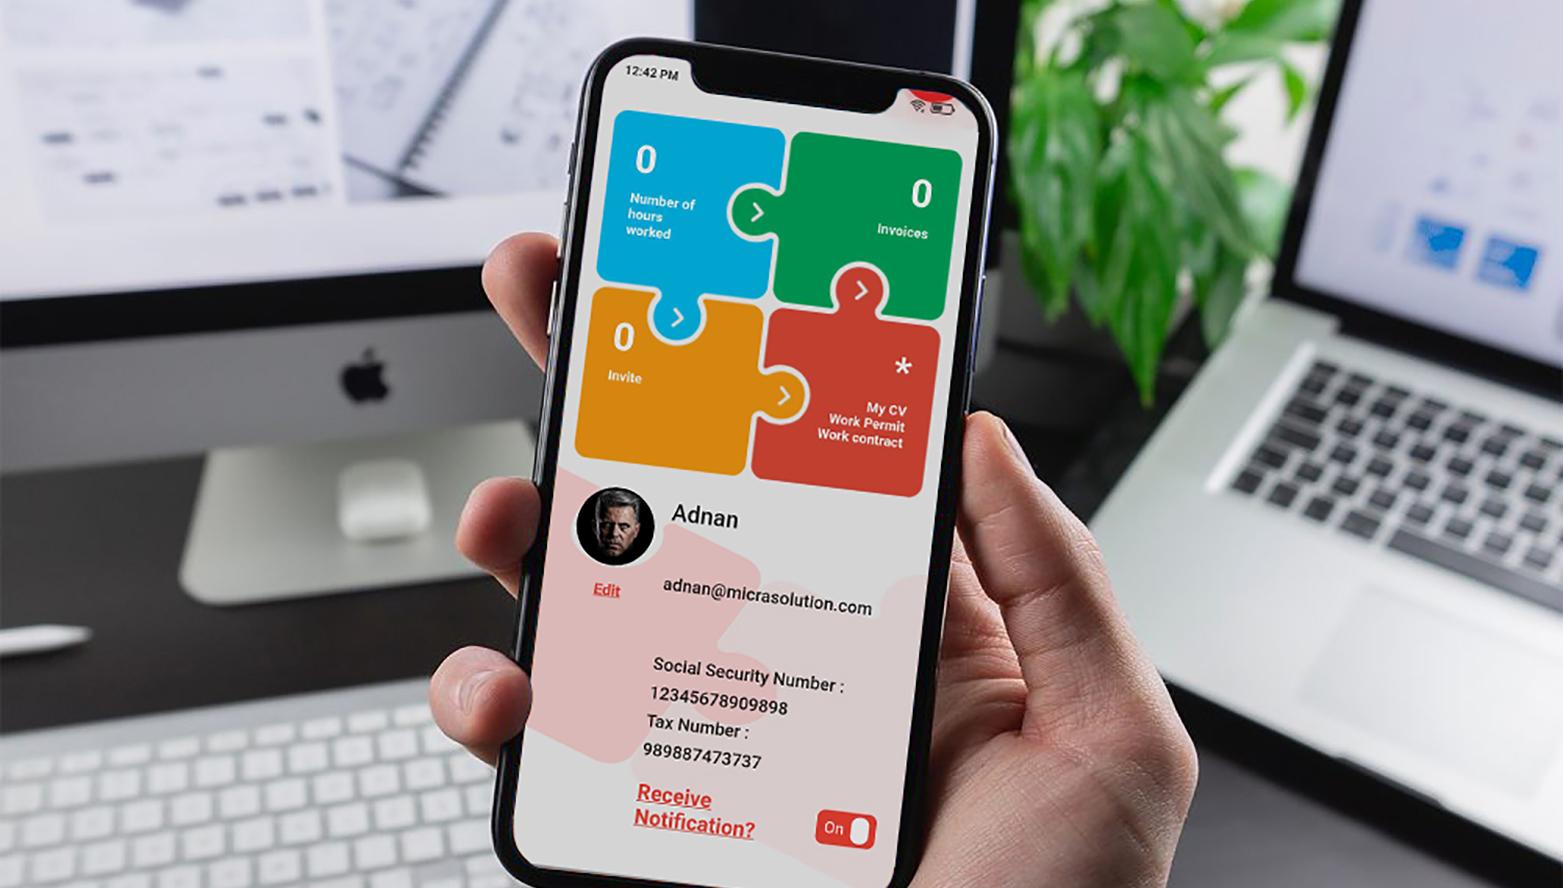 Way2Work mobile app profile screen